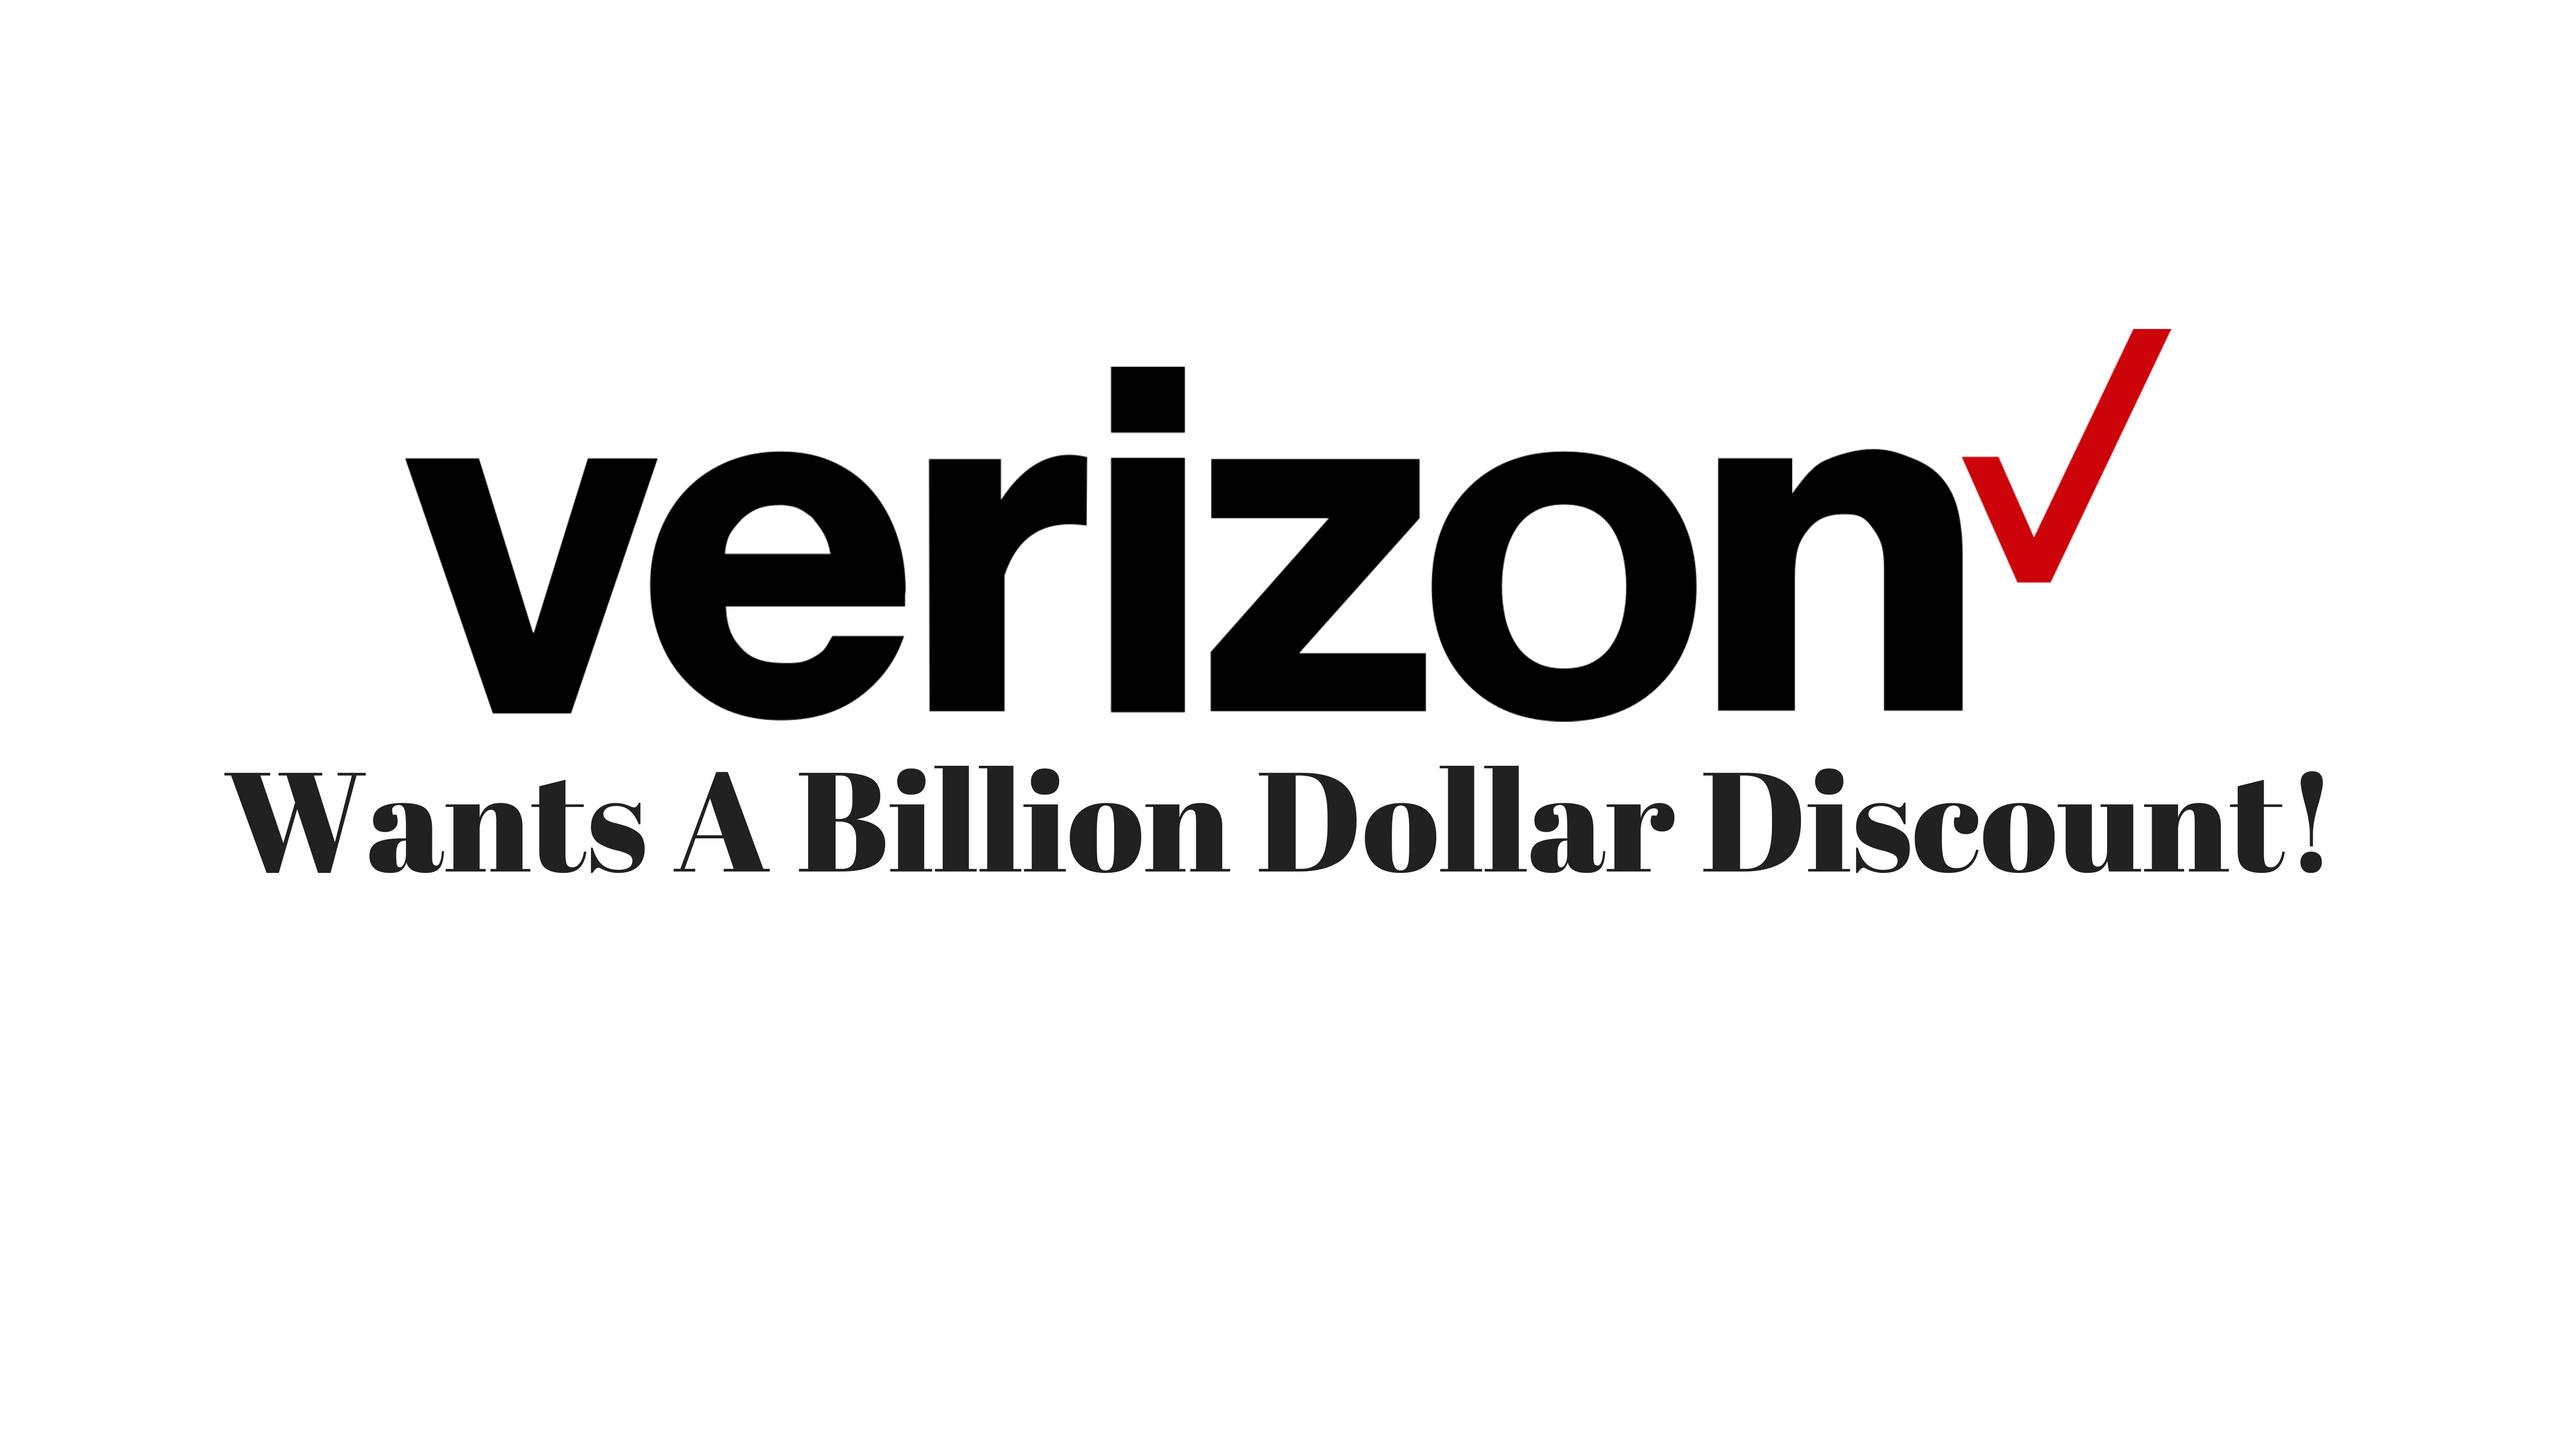 Verizon Backs Away From Yahoo – They Want A Billion Dollar Discount